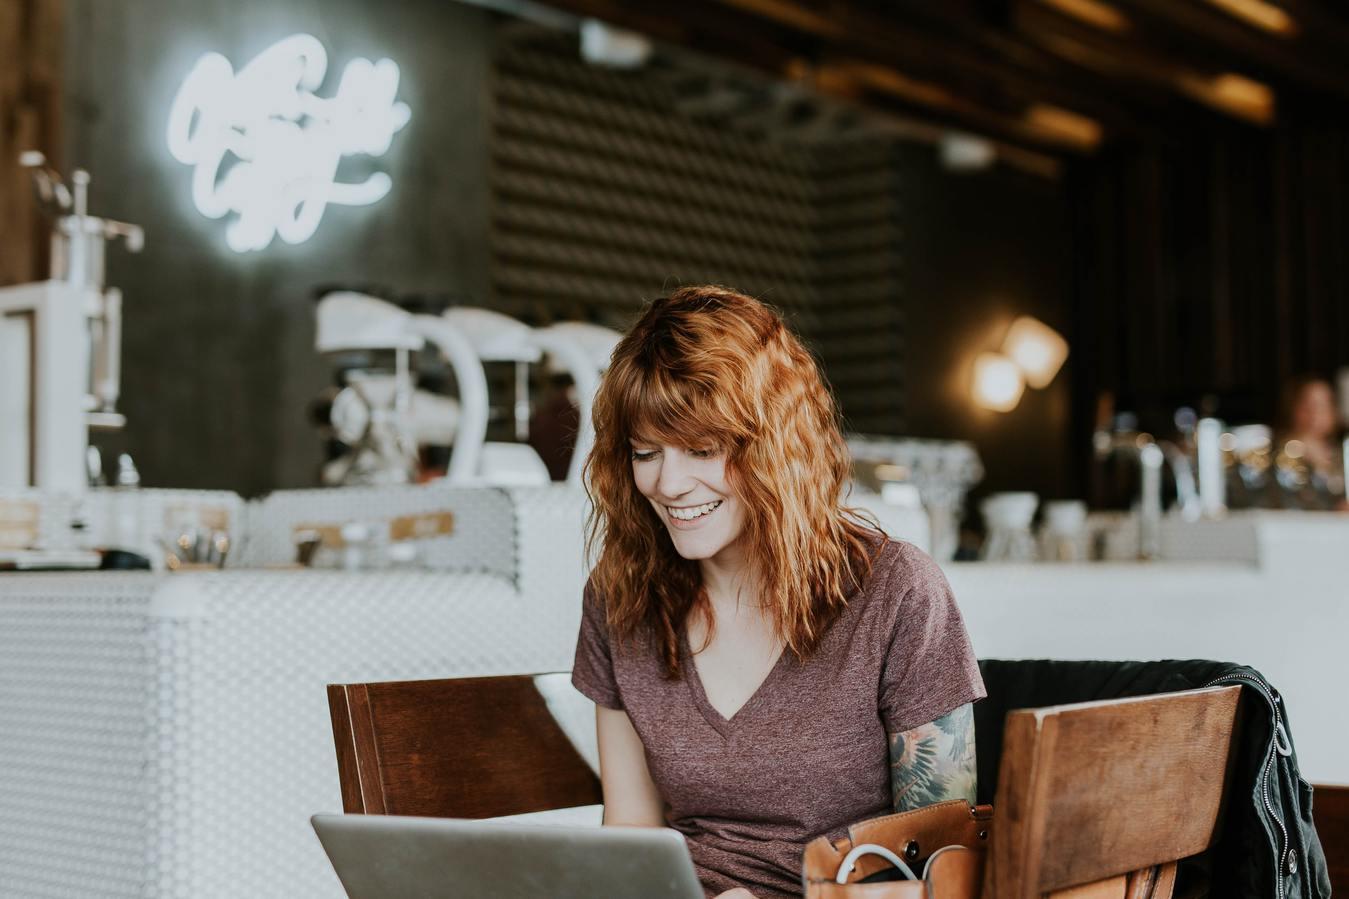 Wanita tersenyum melihat laptop di kafe